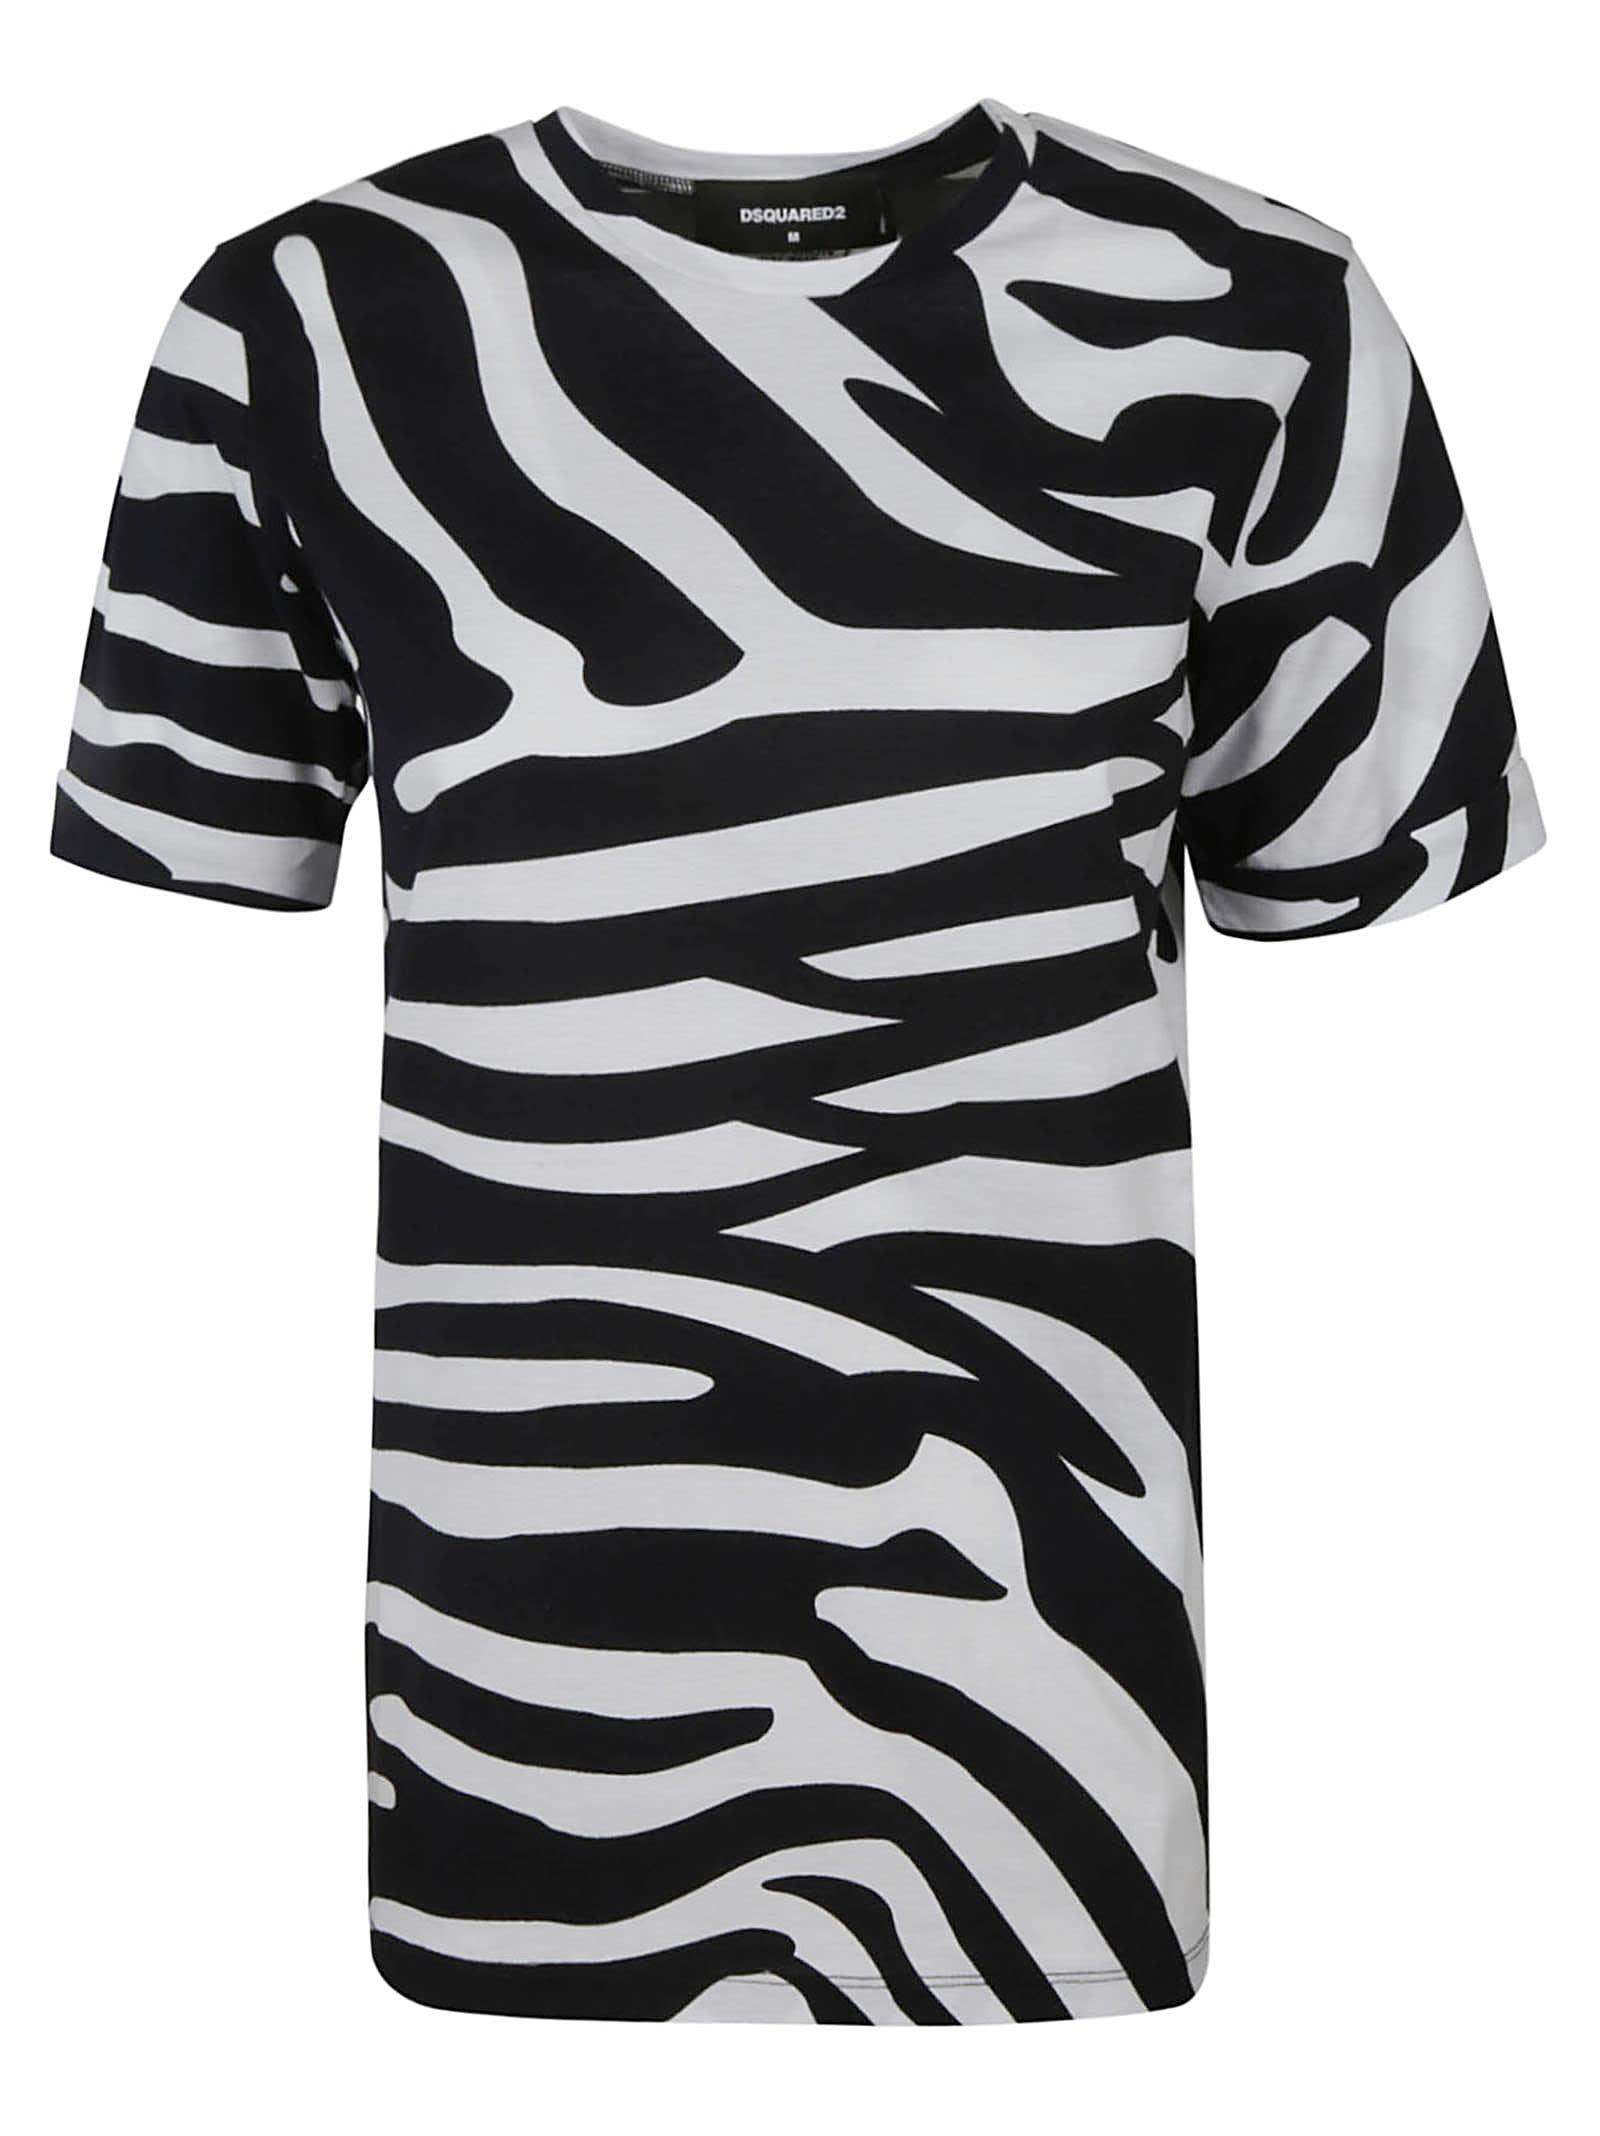 Dsquared2 Zebra Patterned T-shirt